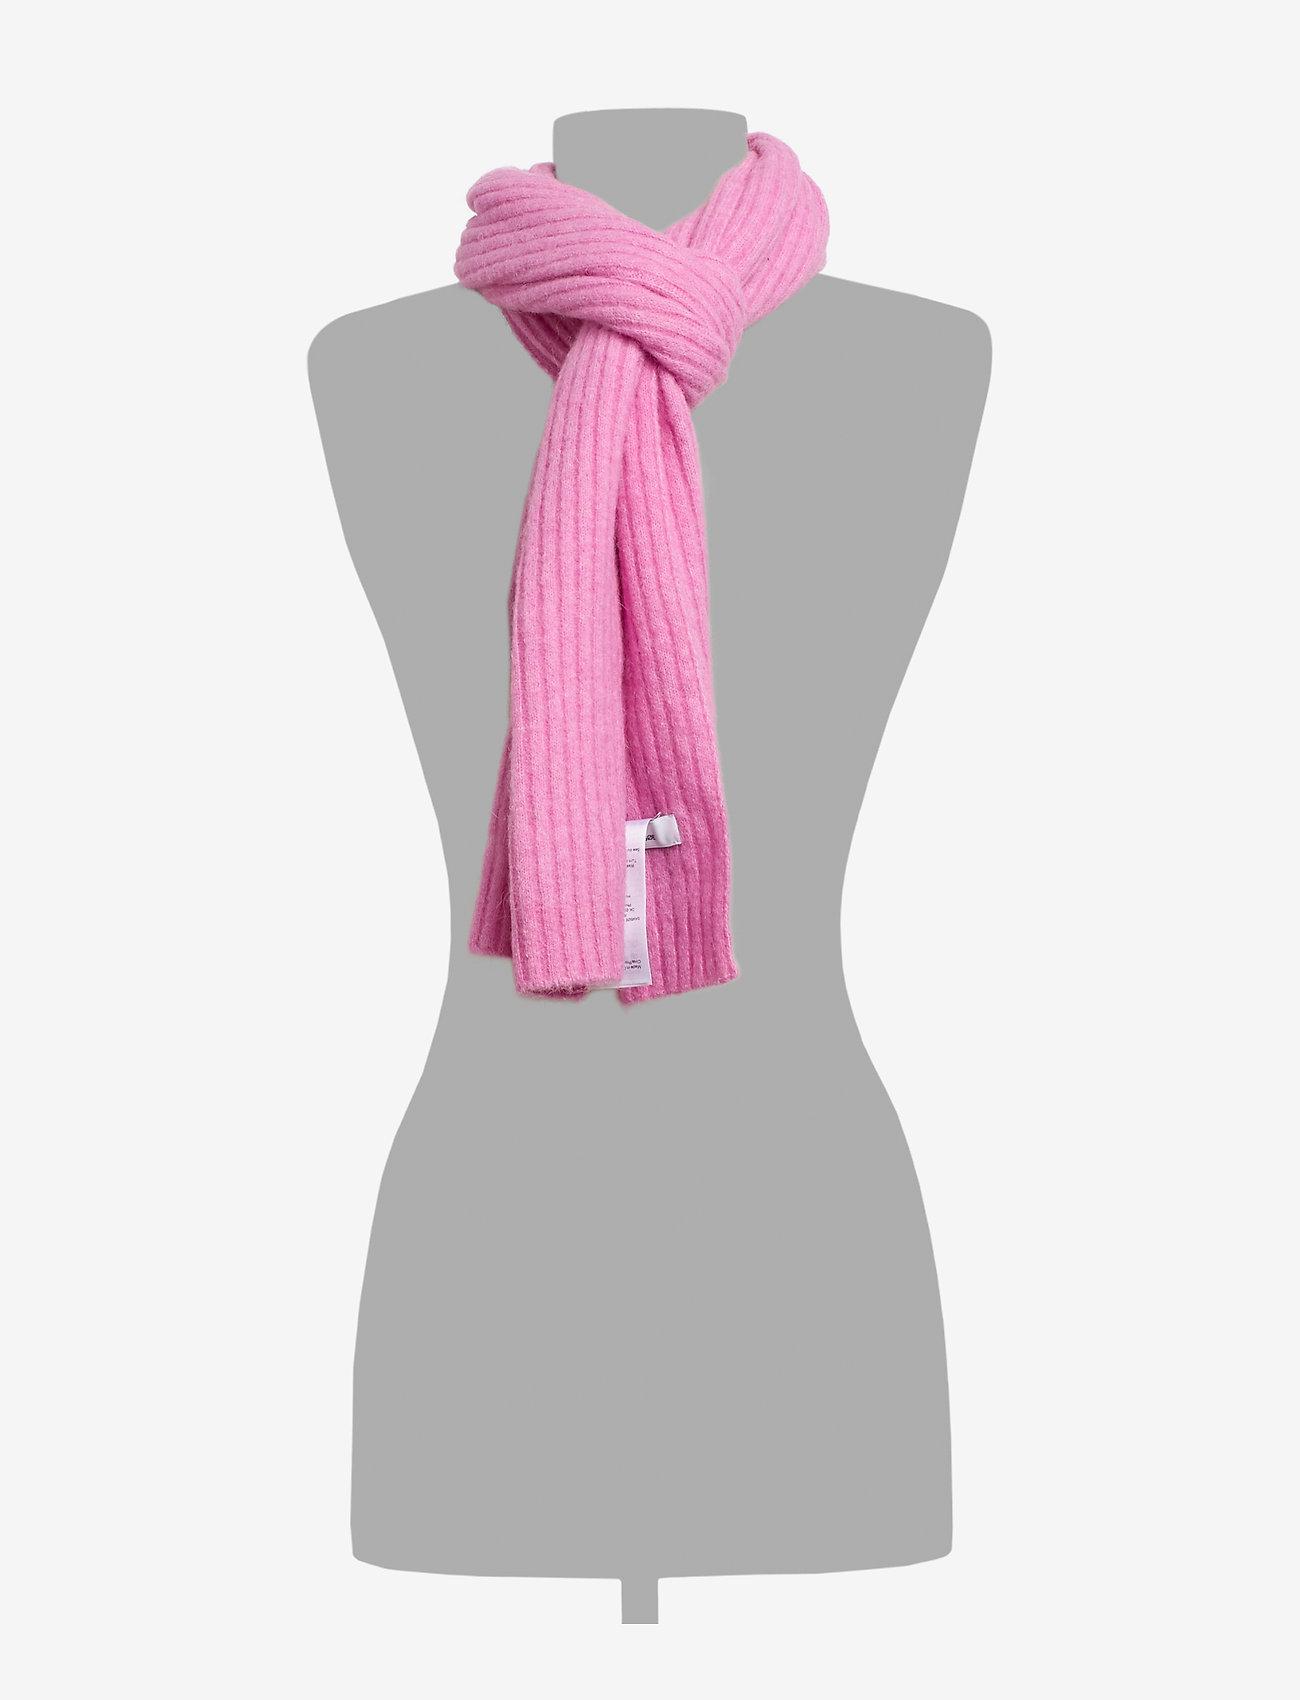 Samsøe Samsøe Nori scarf slim 7355 - Szaliki i chusty BUBBLE GUM PINK MEL. - Akcesoria